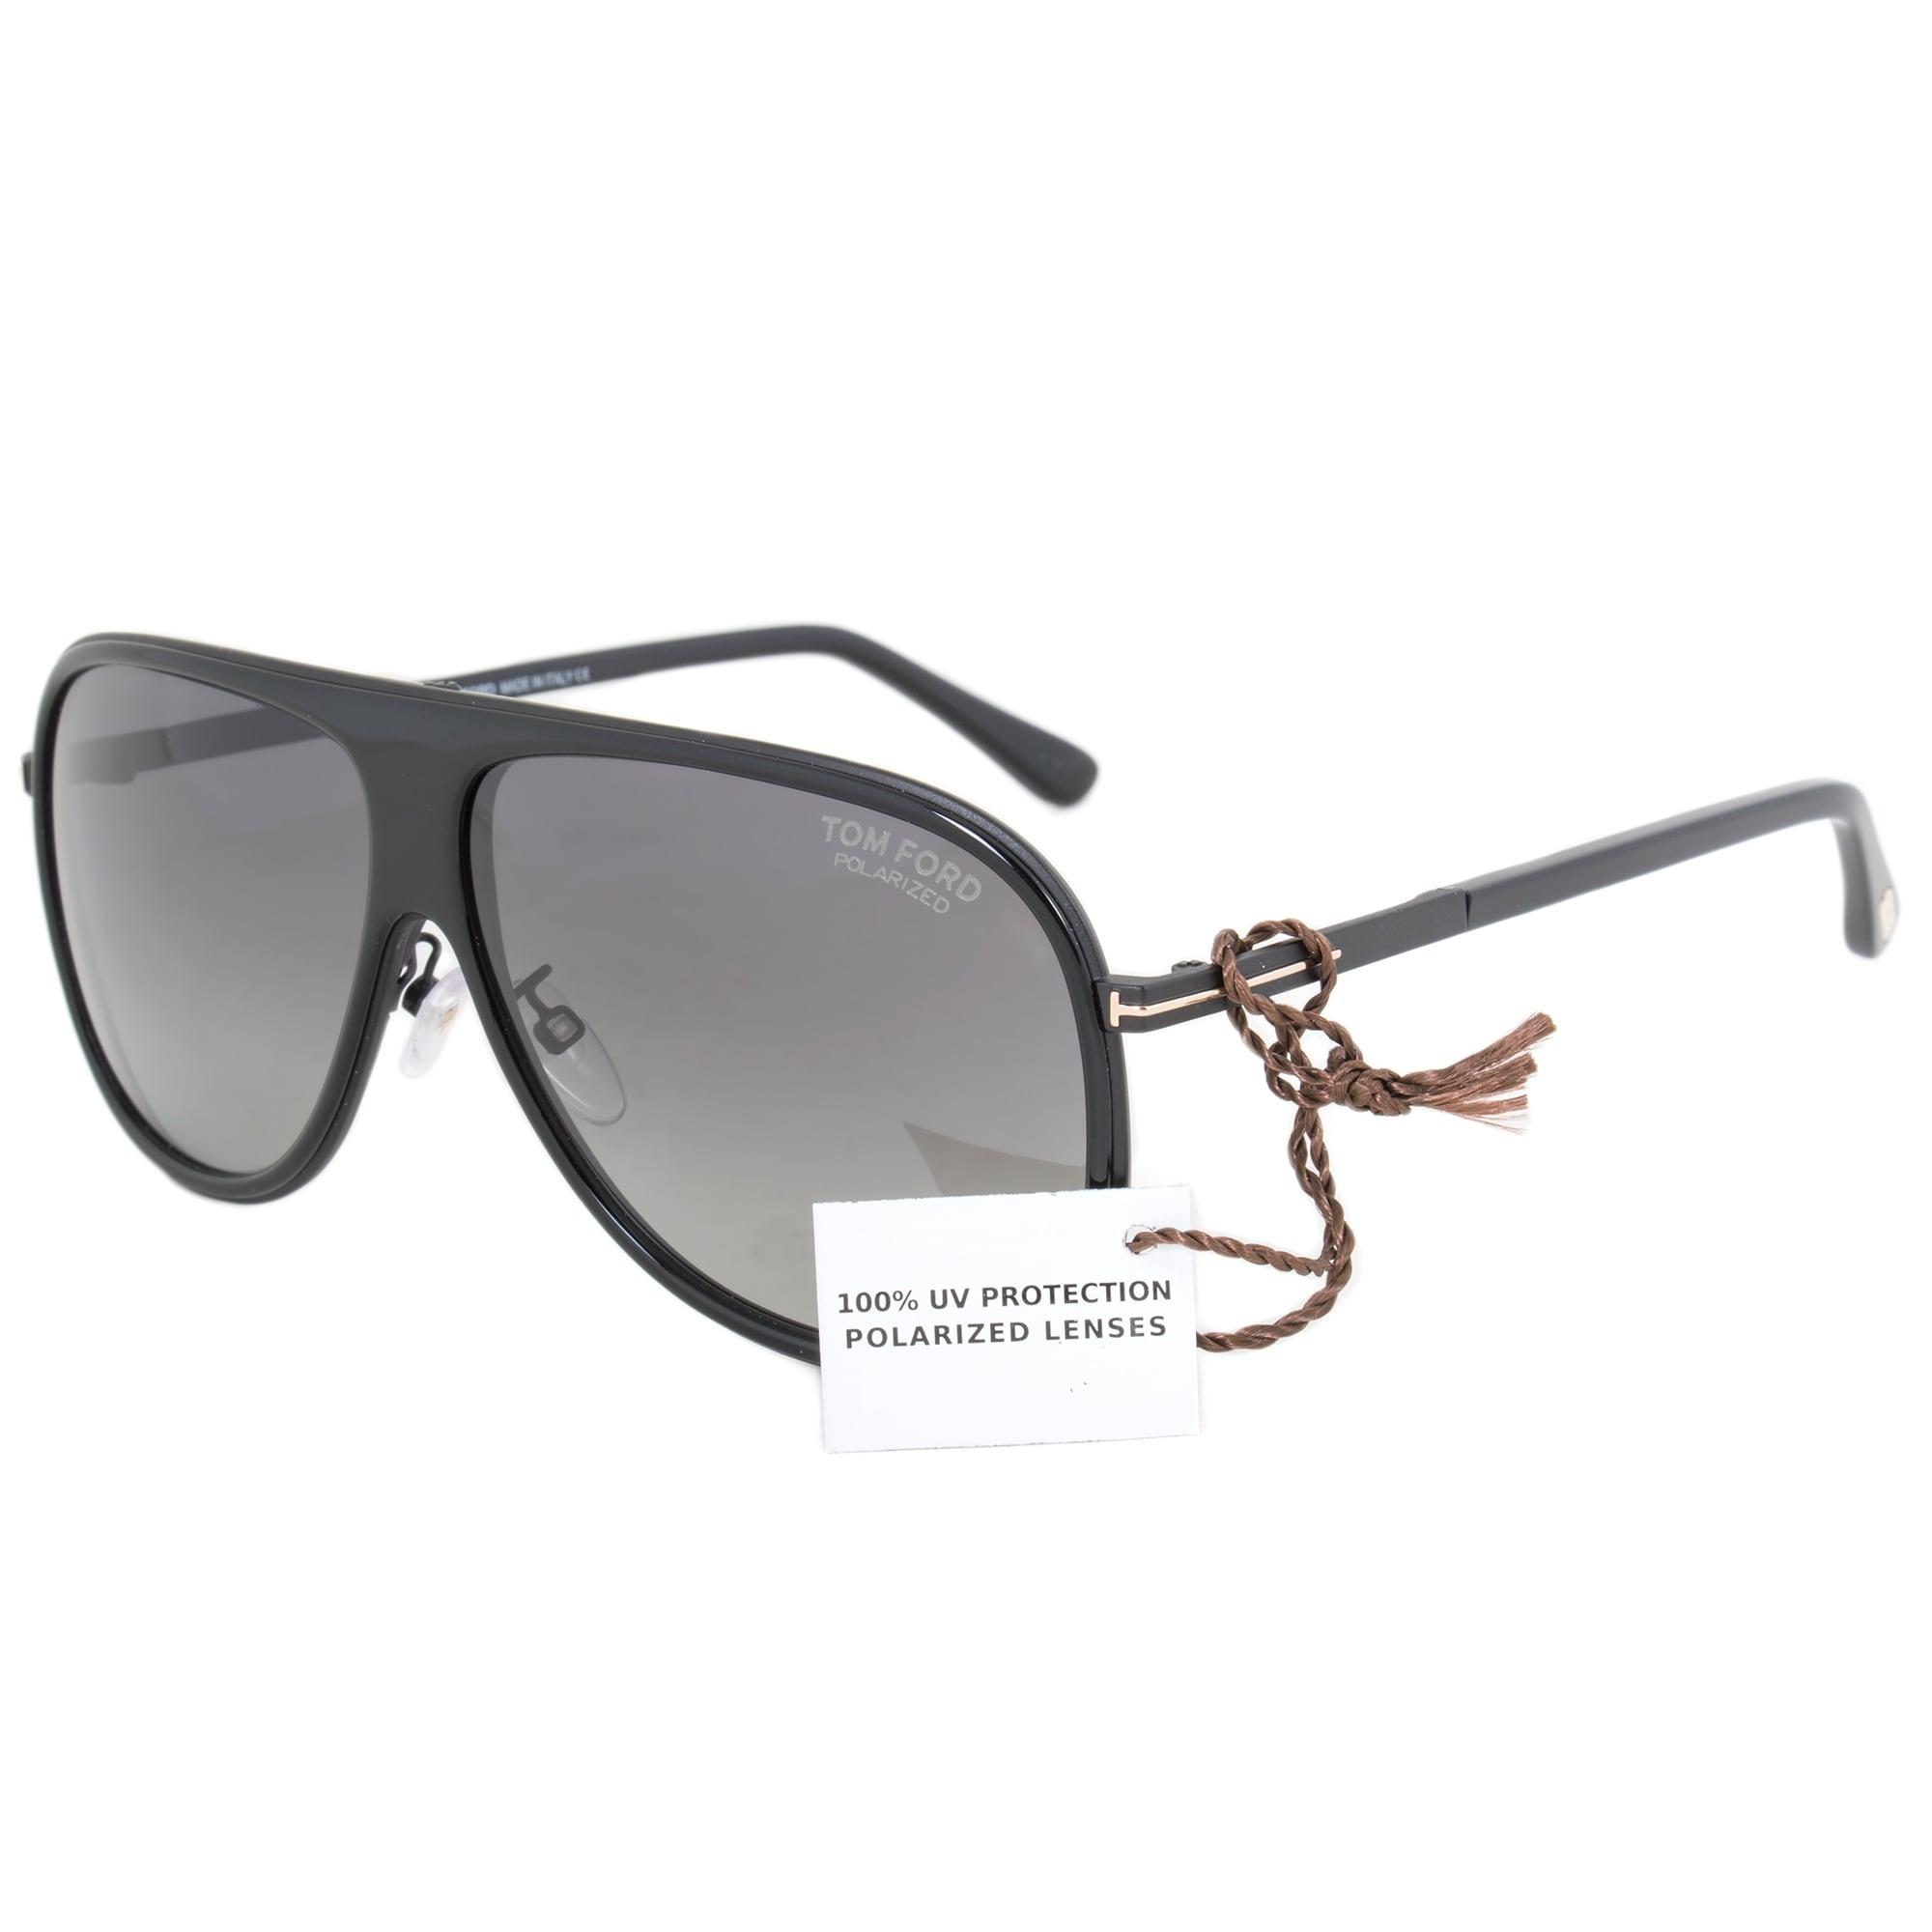 1df13472b75 Tom Ford Men s Sunglasses